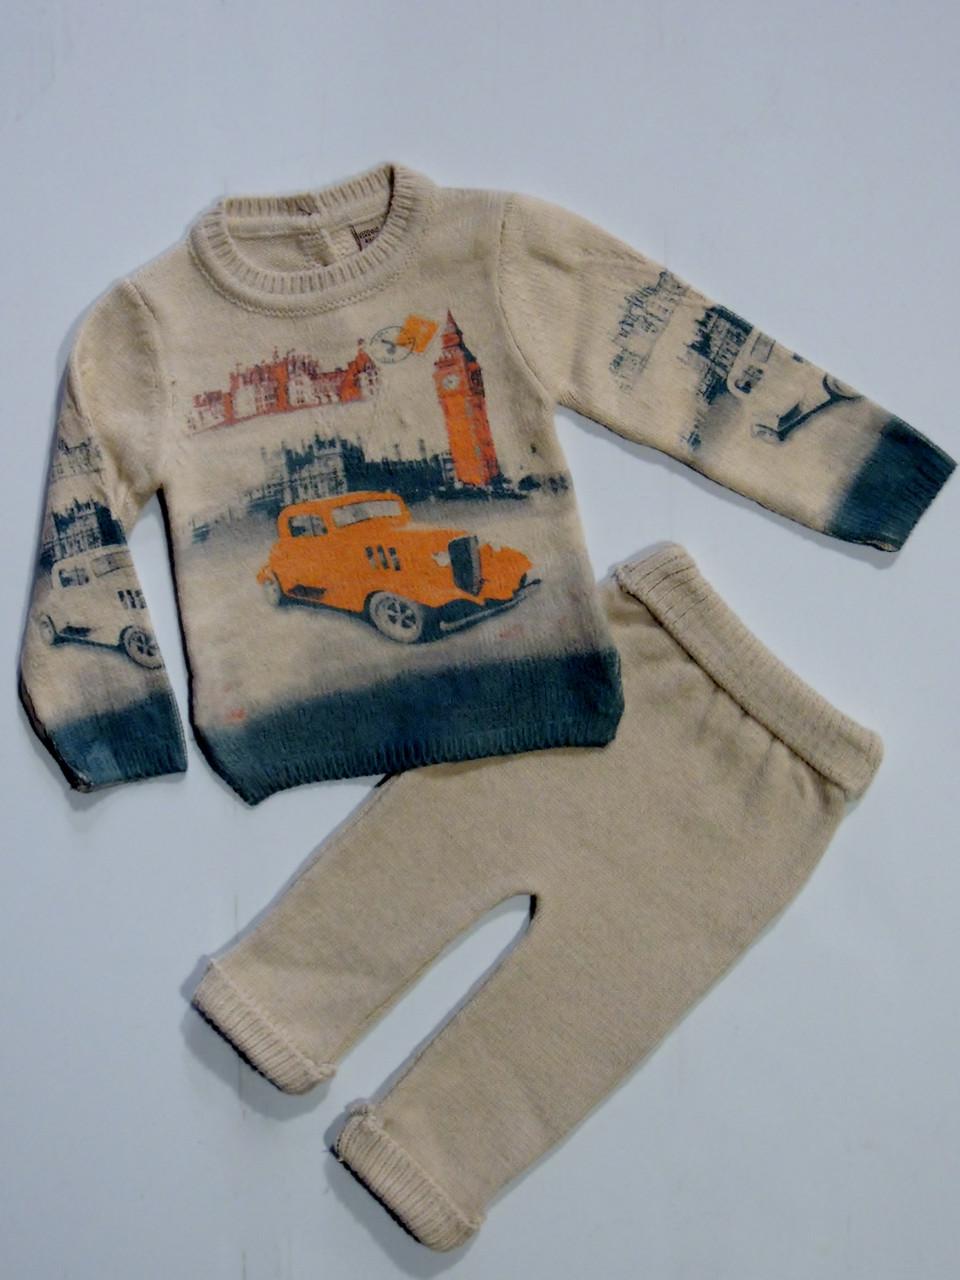 тёплый вязаный костюм на мальчика 36912 месяцев цена 600 грн